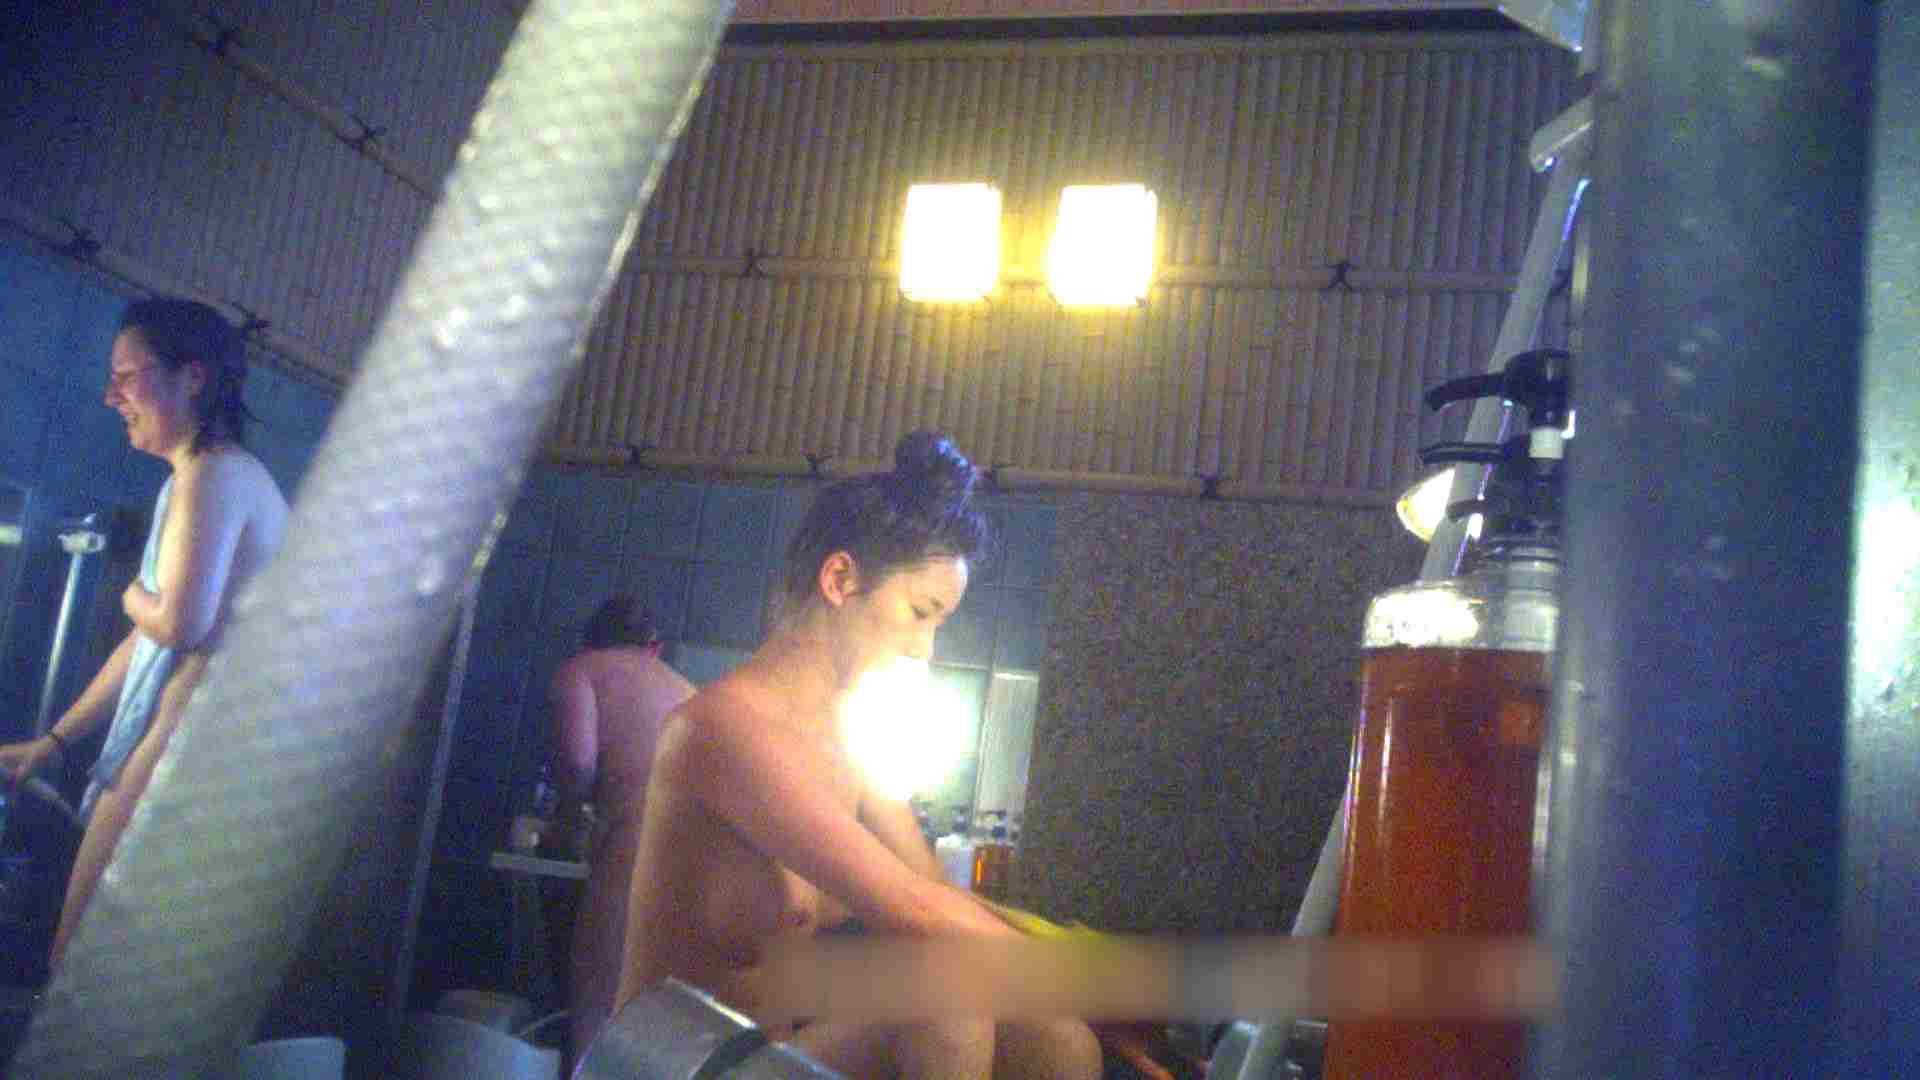 TG.15 【上等兵】高級旅館の爆乳女将で有名っぽい 爆乳  64pic 48